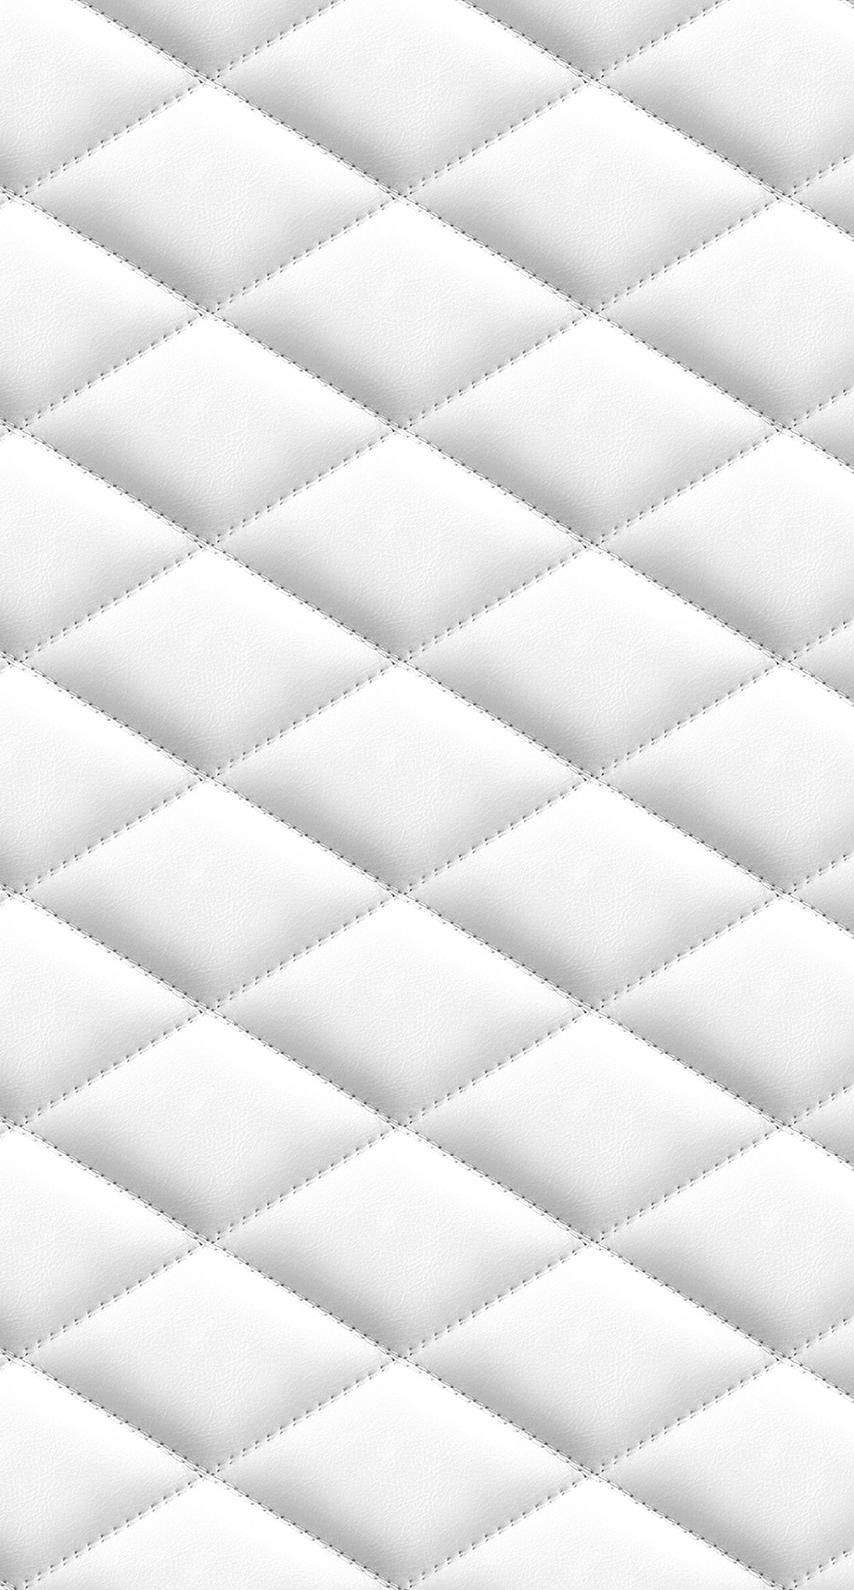 net, square